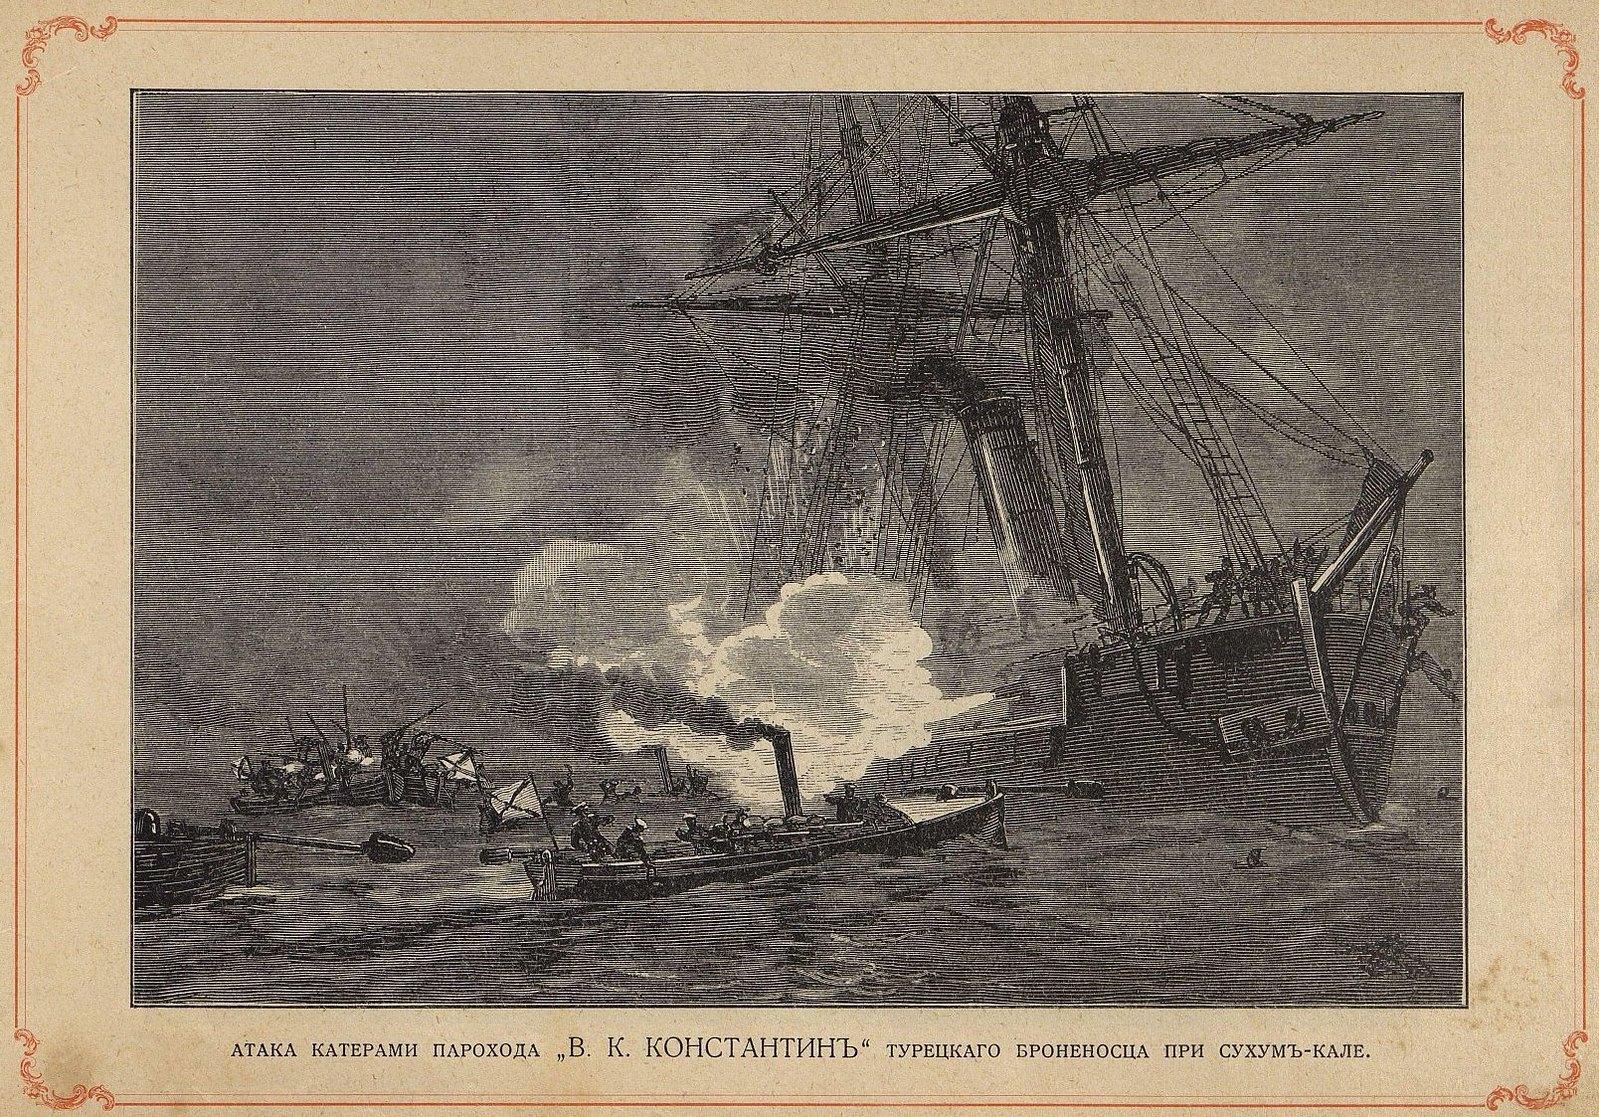 Атака катерами парохода «В.К. Константин» турецкого броненосца при Сухум-кале